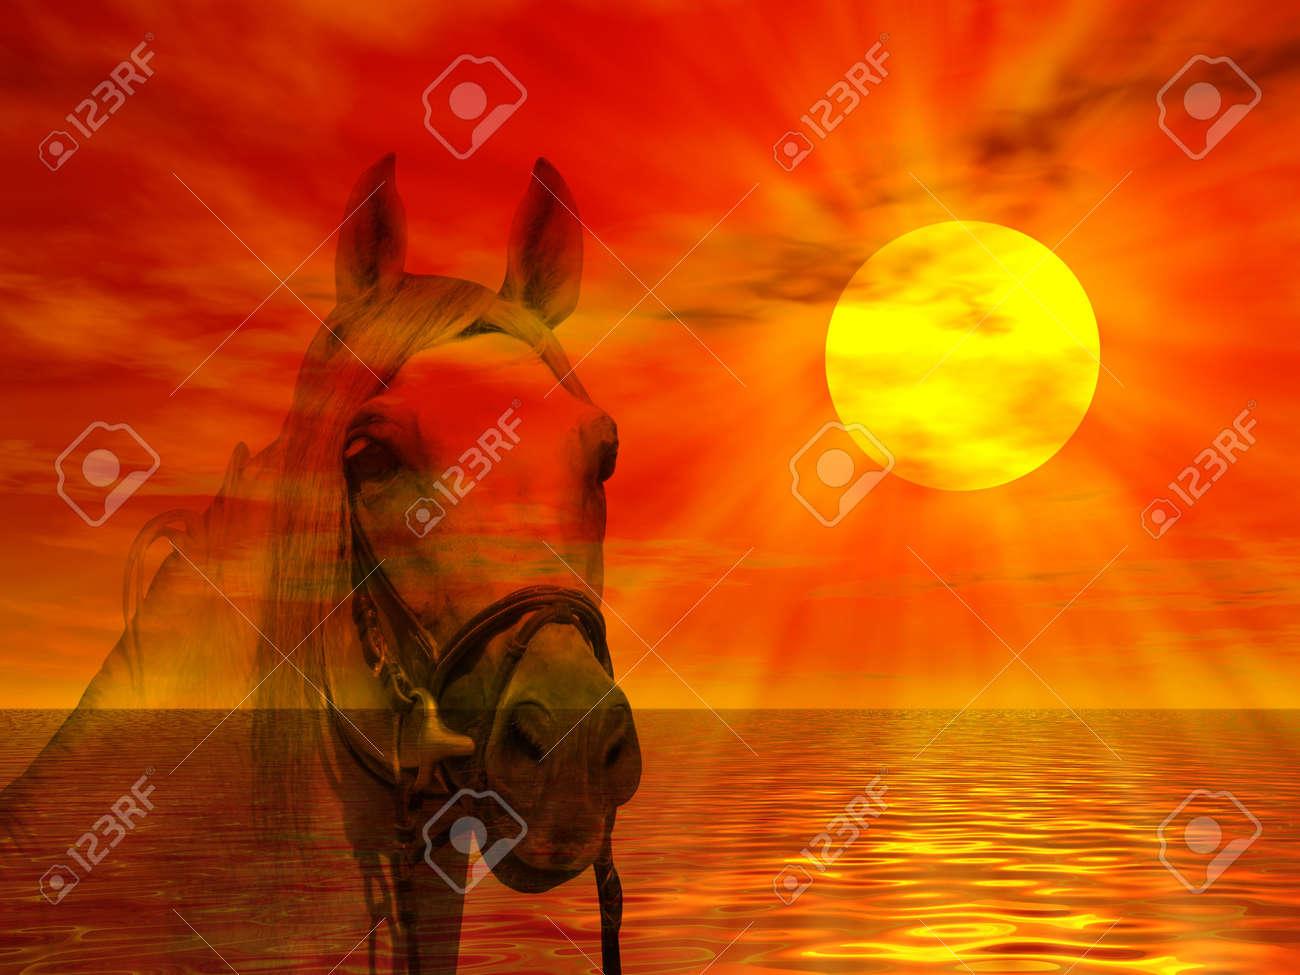 Horse portrait on a colorful sunset landscape Stock Photo - 2735820